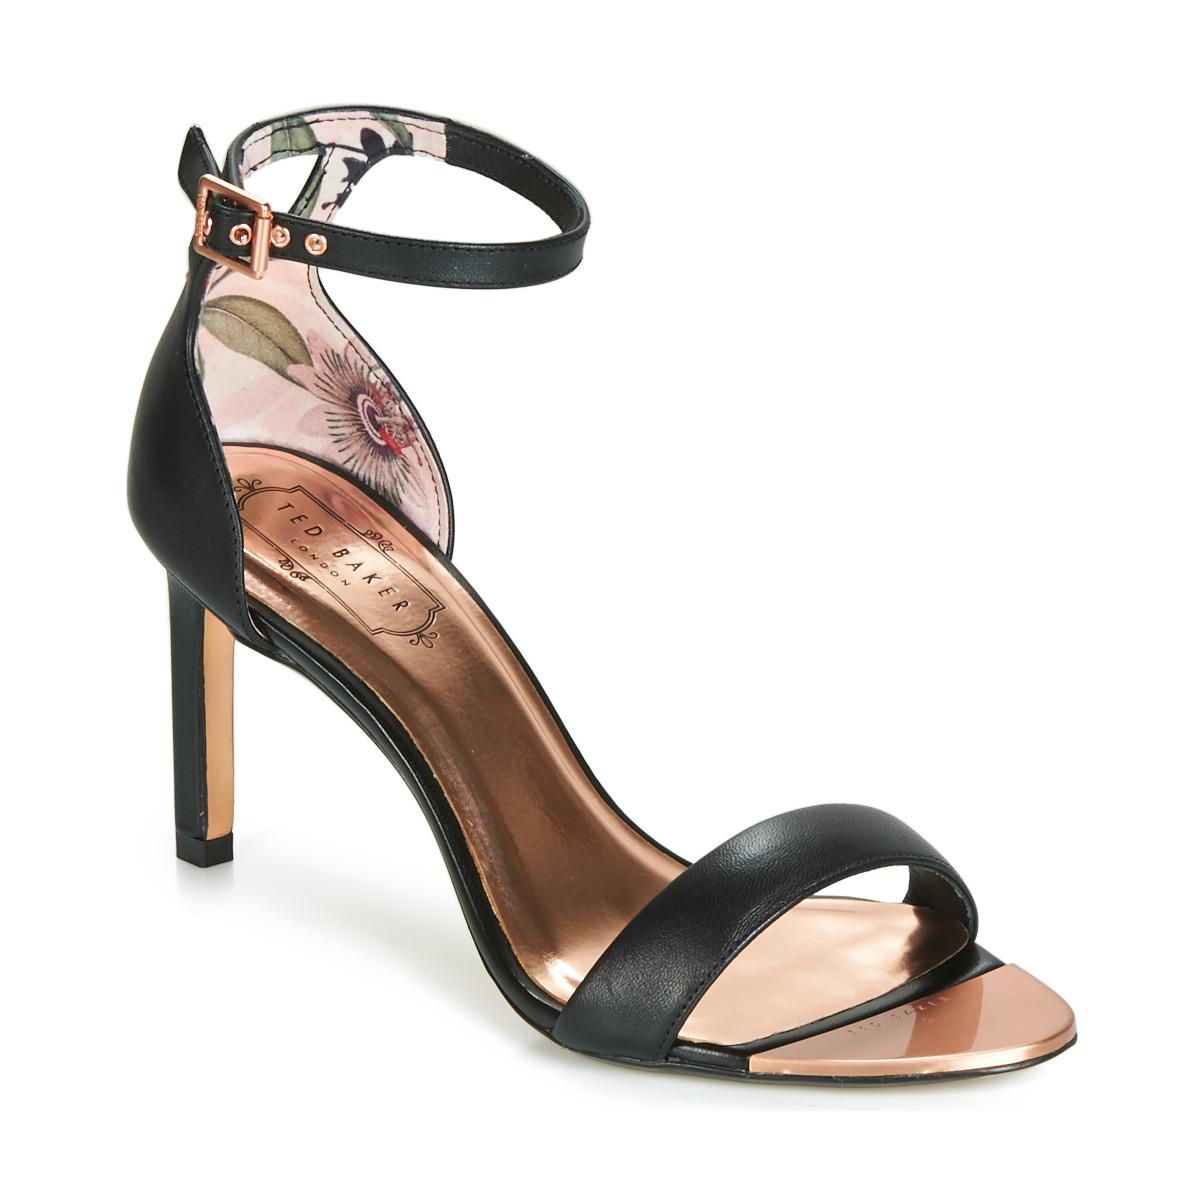 dd9ada58b Ted Baker Ulanii Women s Sandals In Black in Black - Lyst